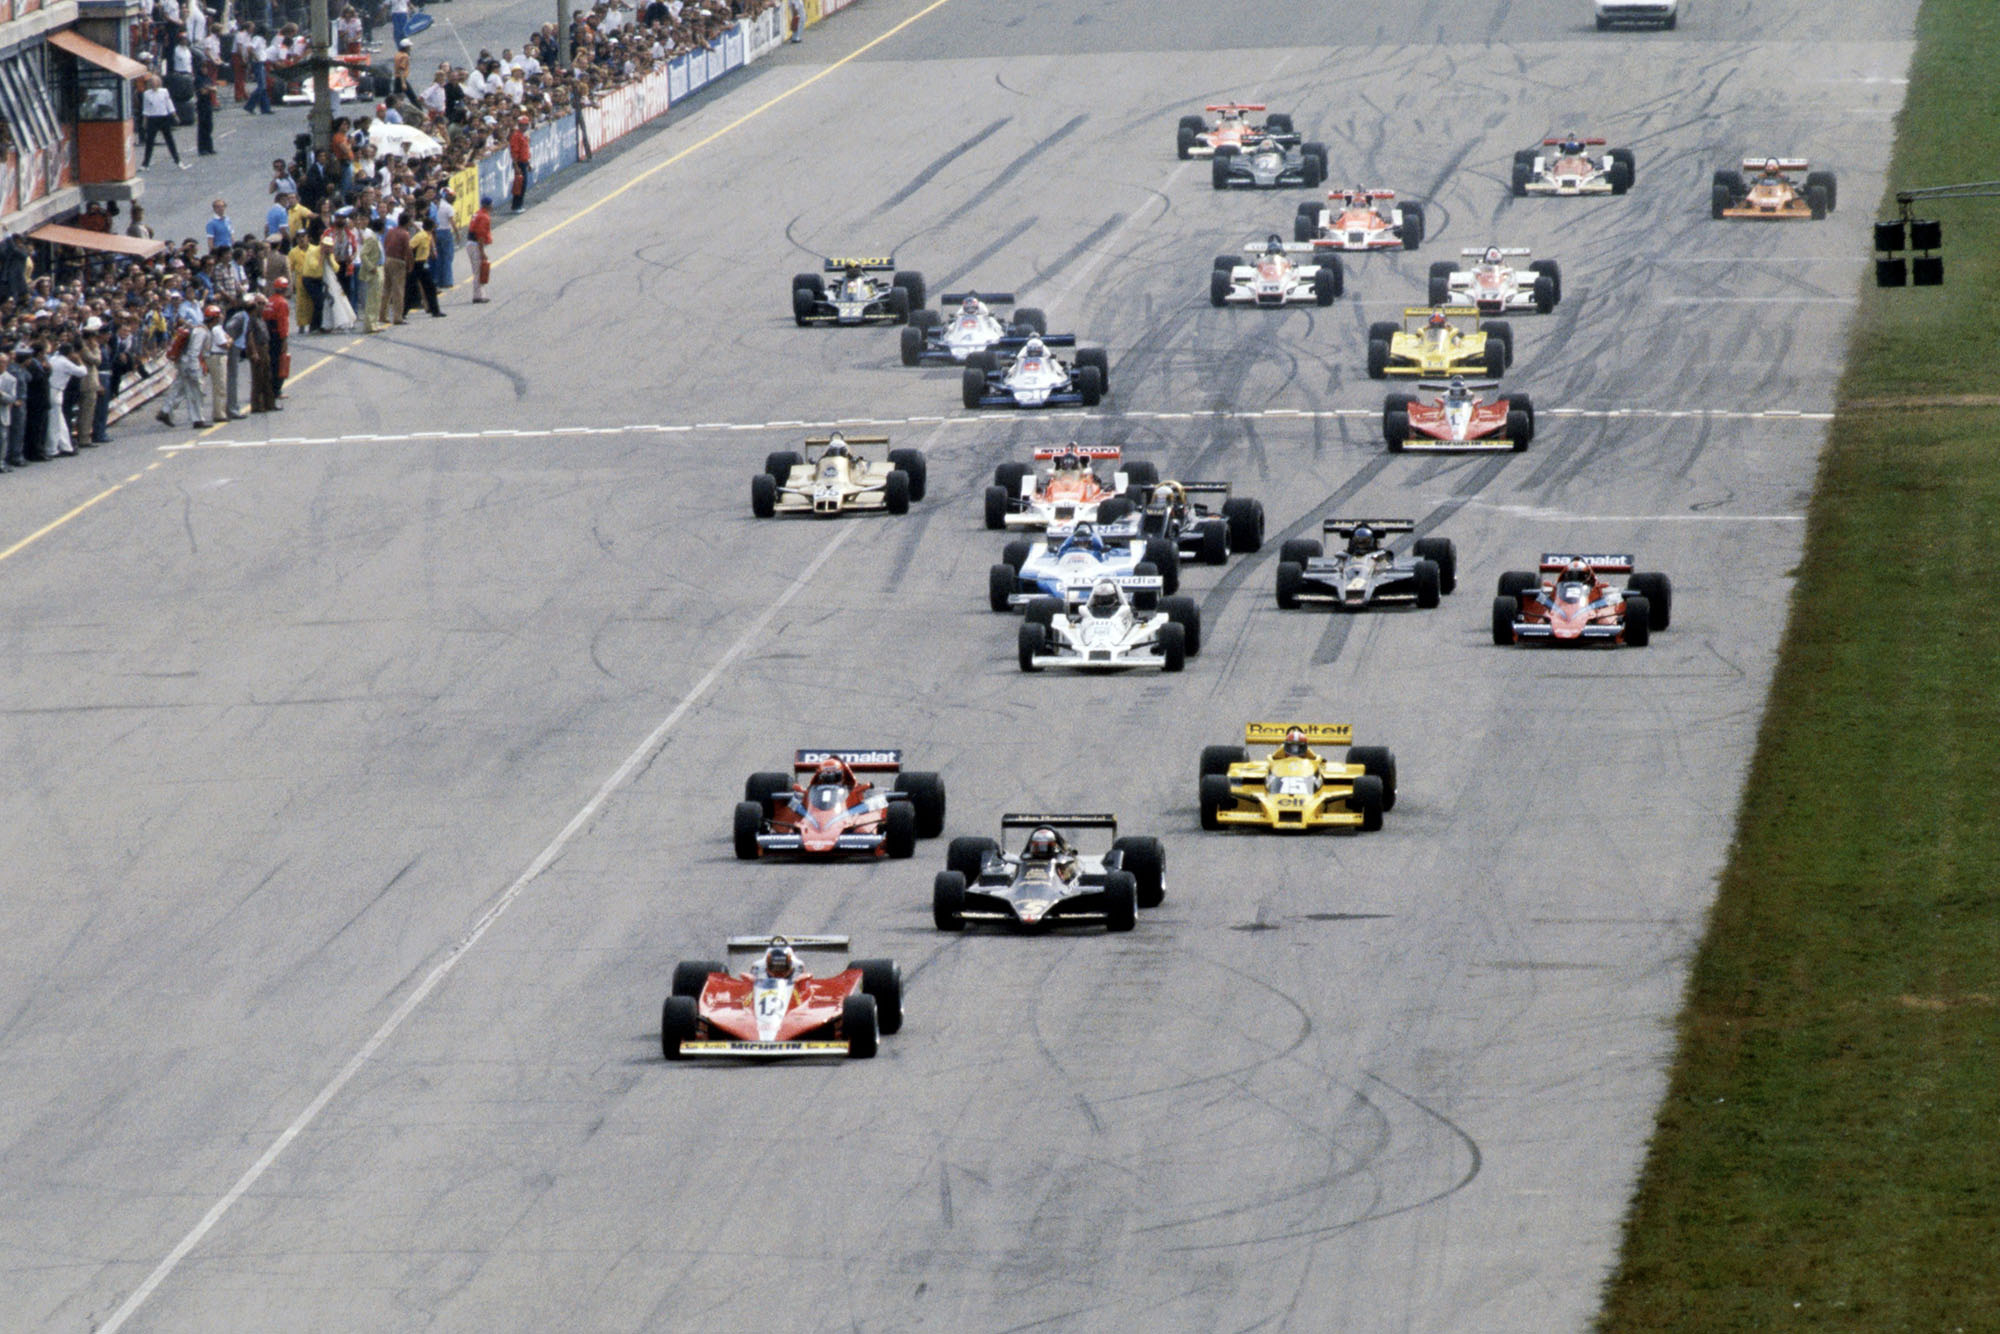 The 1978 Italian Grand Prix gets underway at Monza